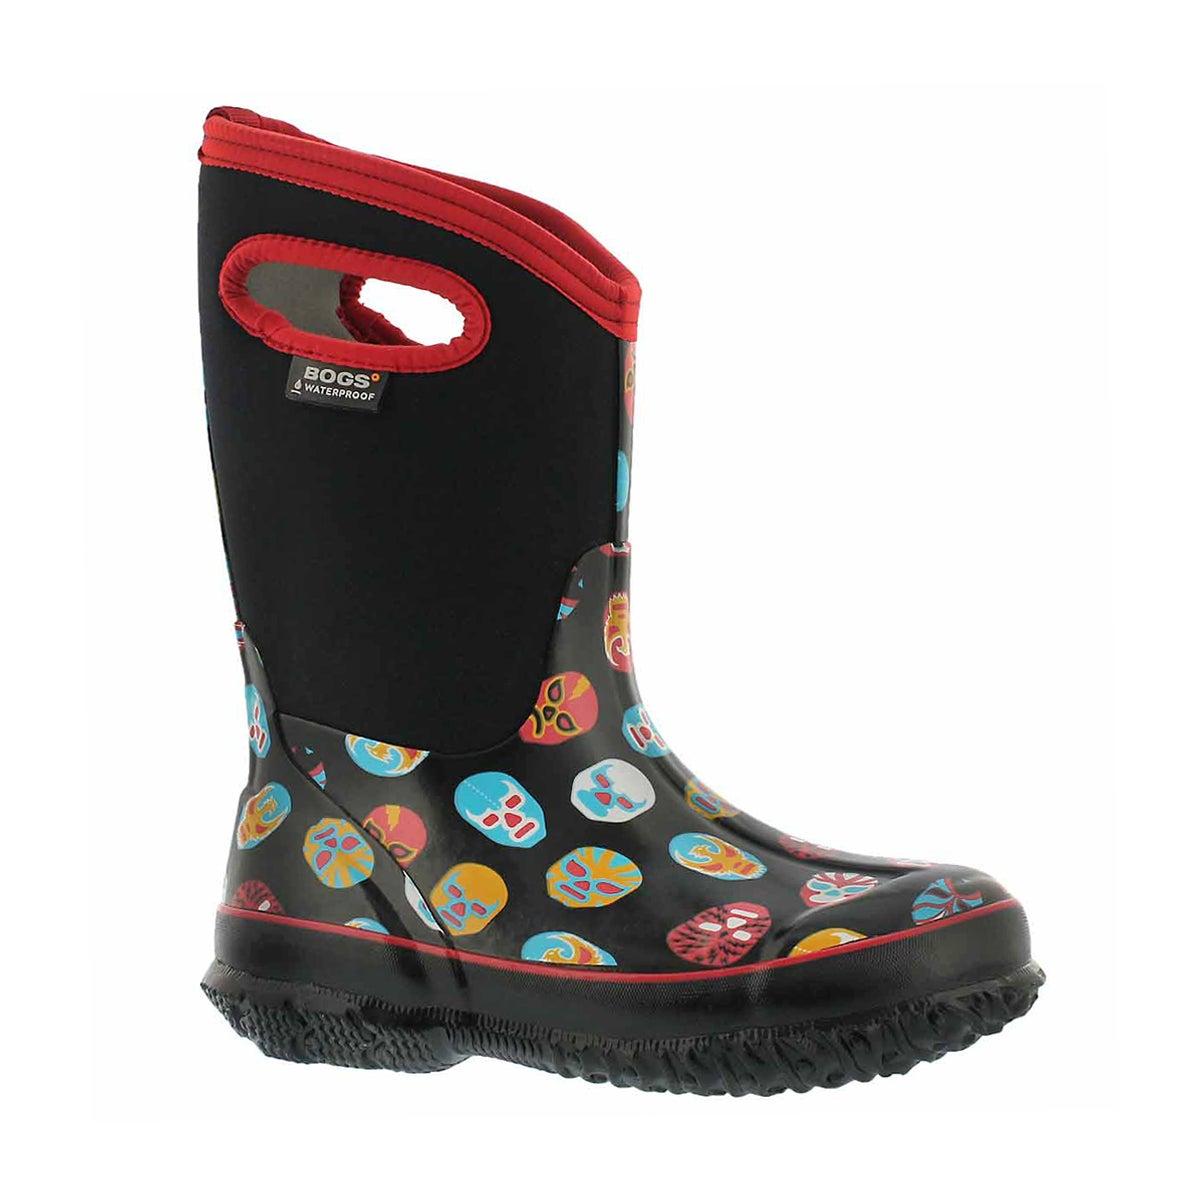 Boys' CLASSIC MASK black multi waterproof boots